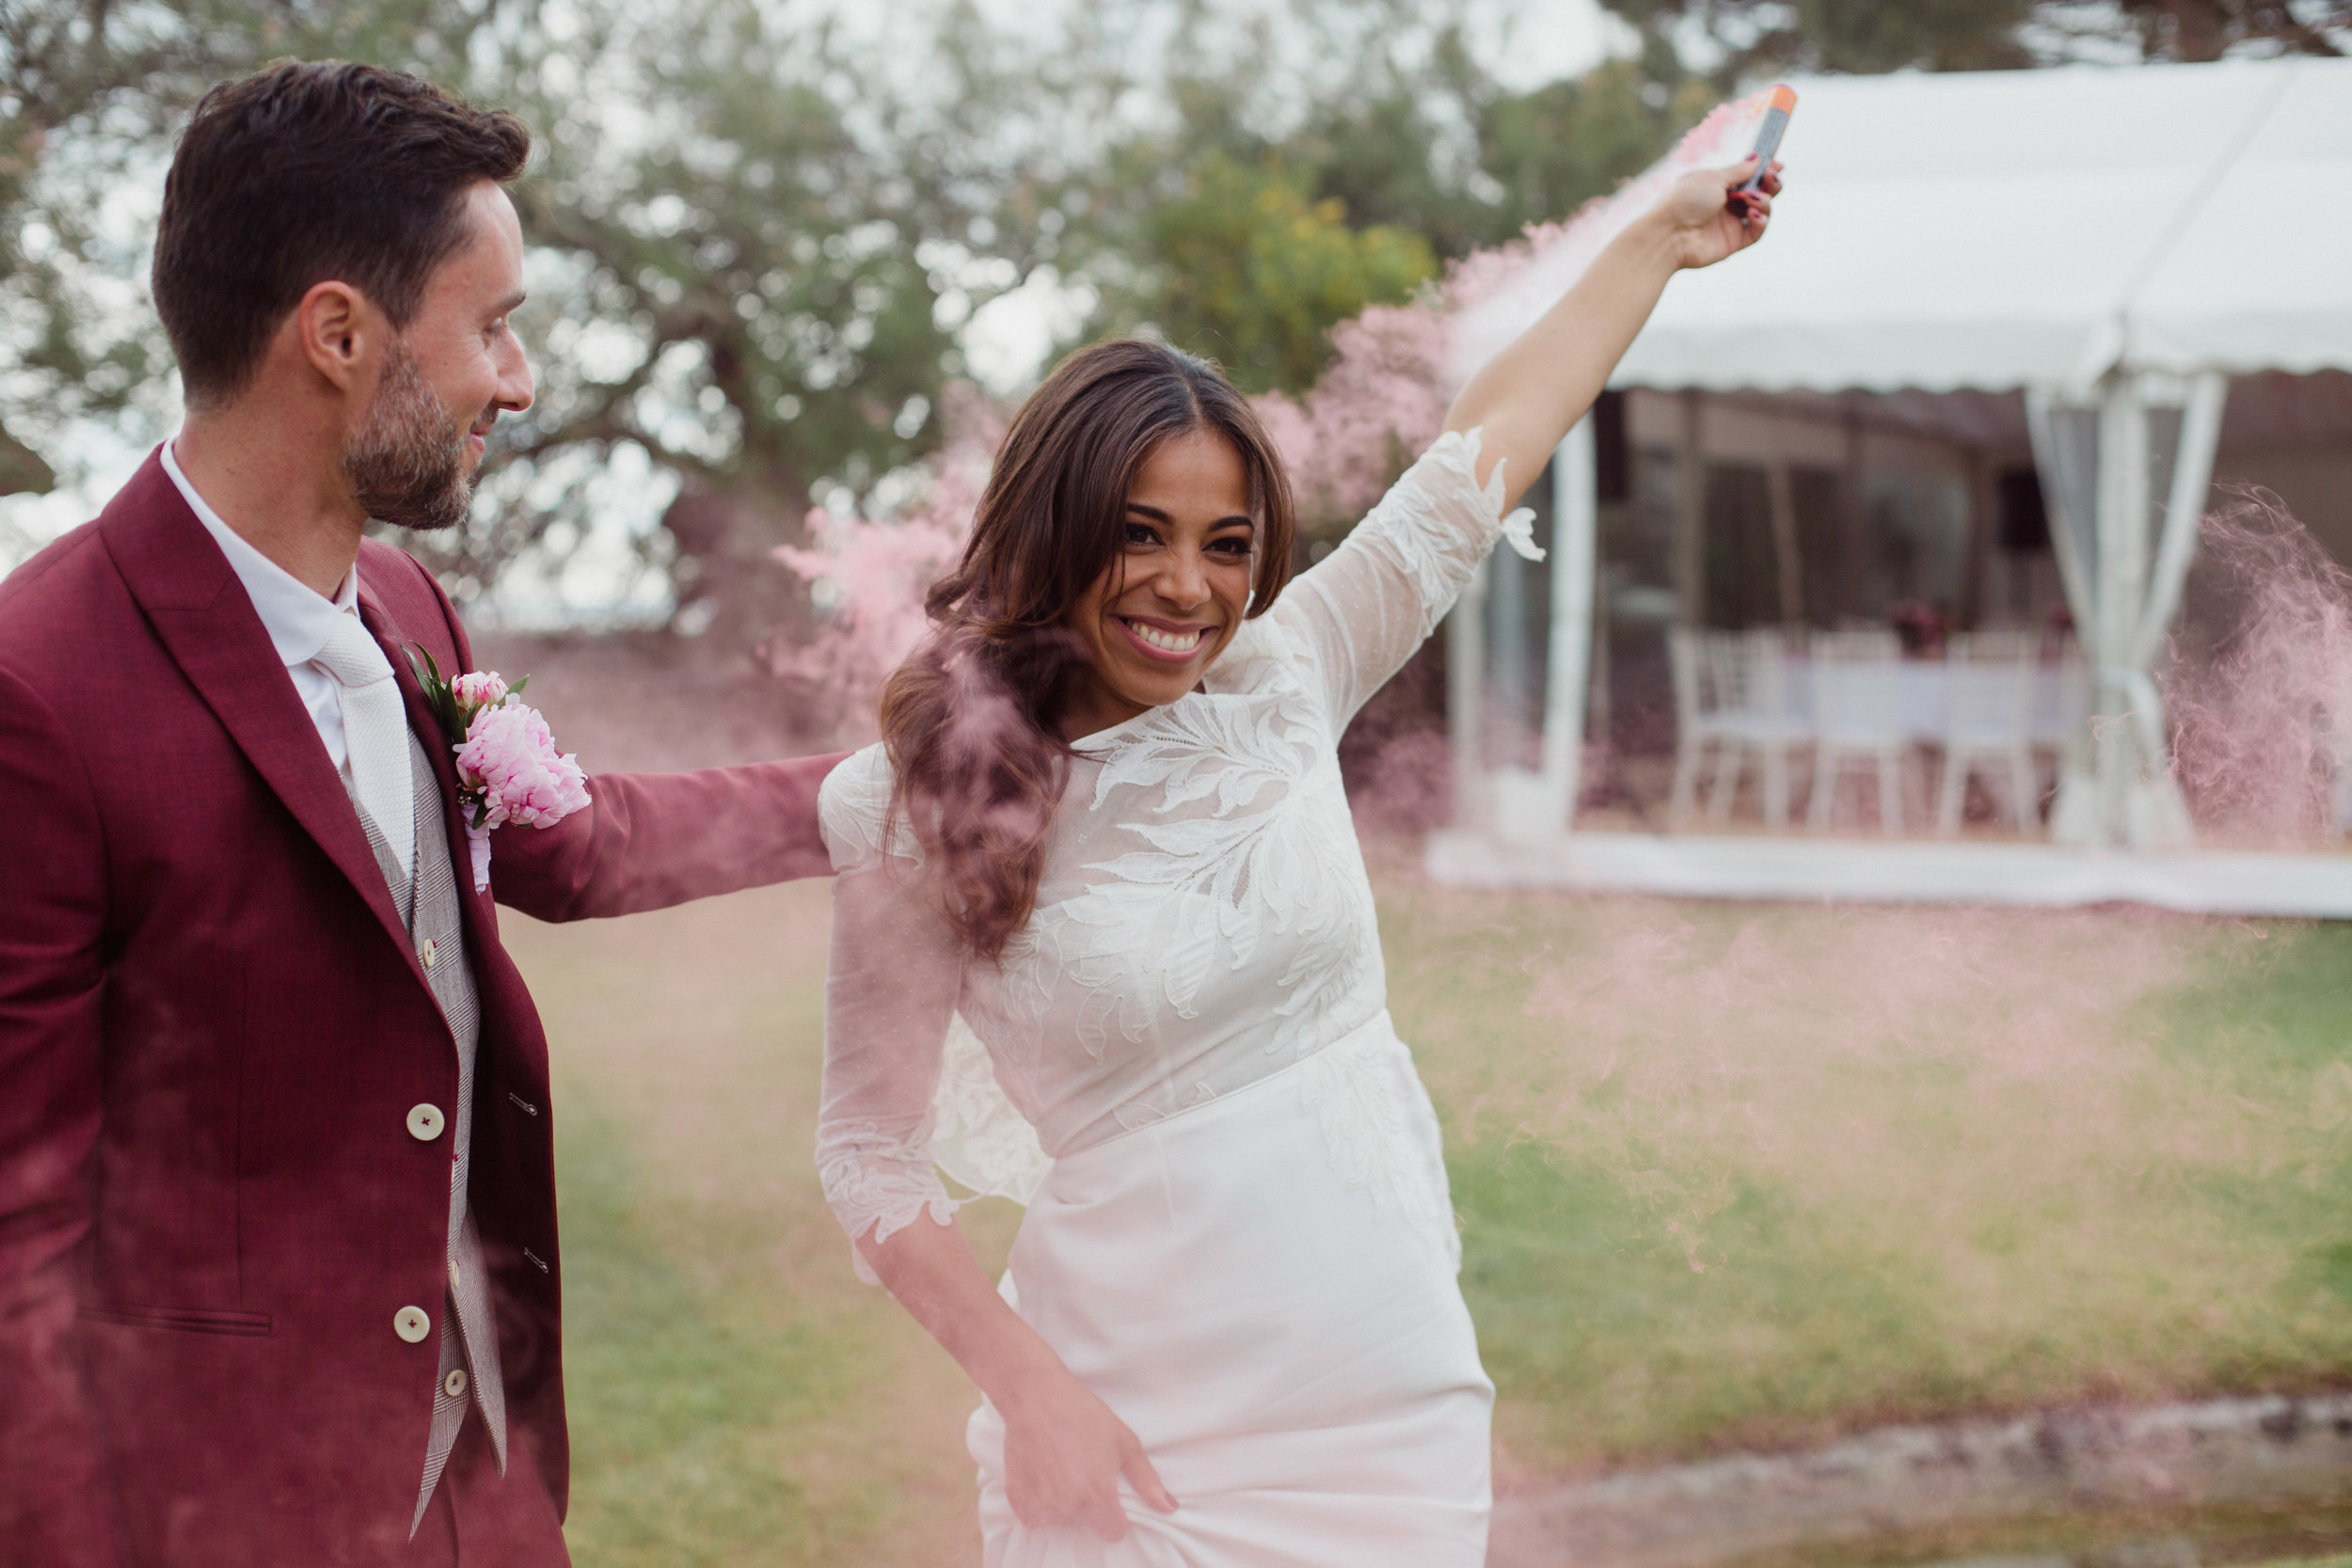 mariage_tropical_bassin_arcachon_villa_latosca_fumigene_photographe_sudouest_pauline_maroussia